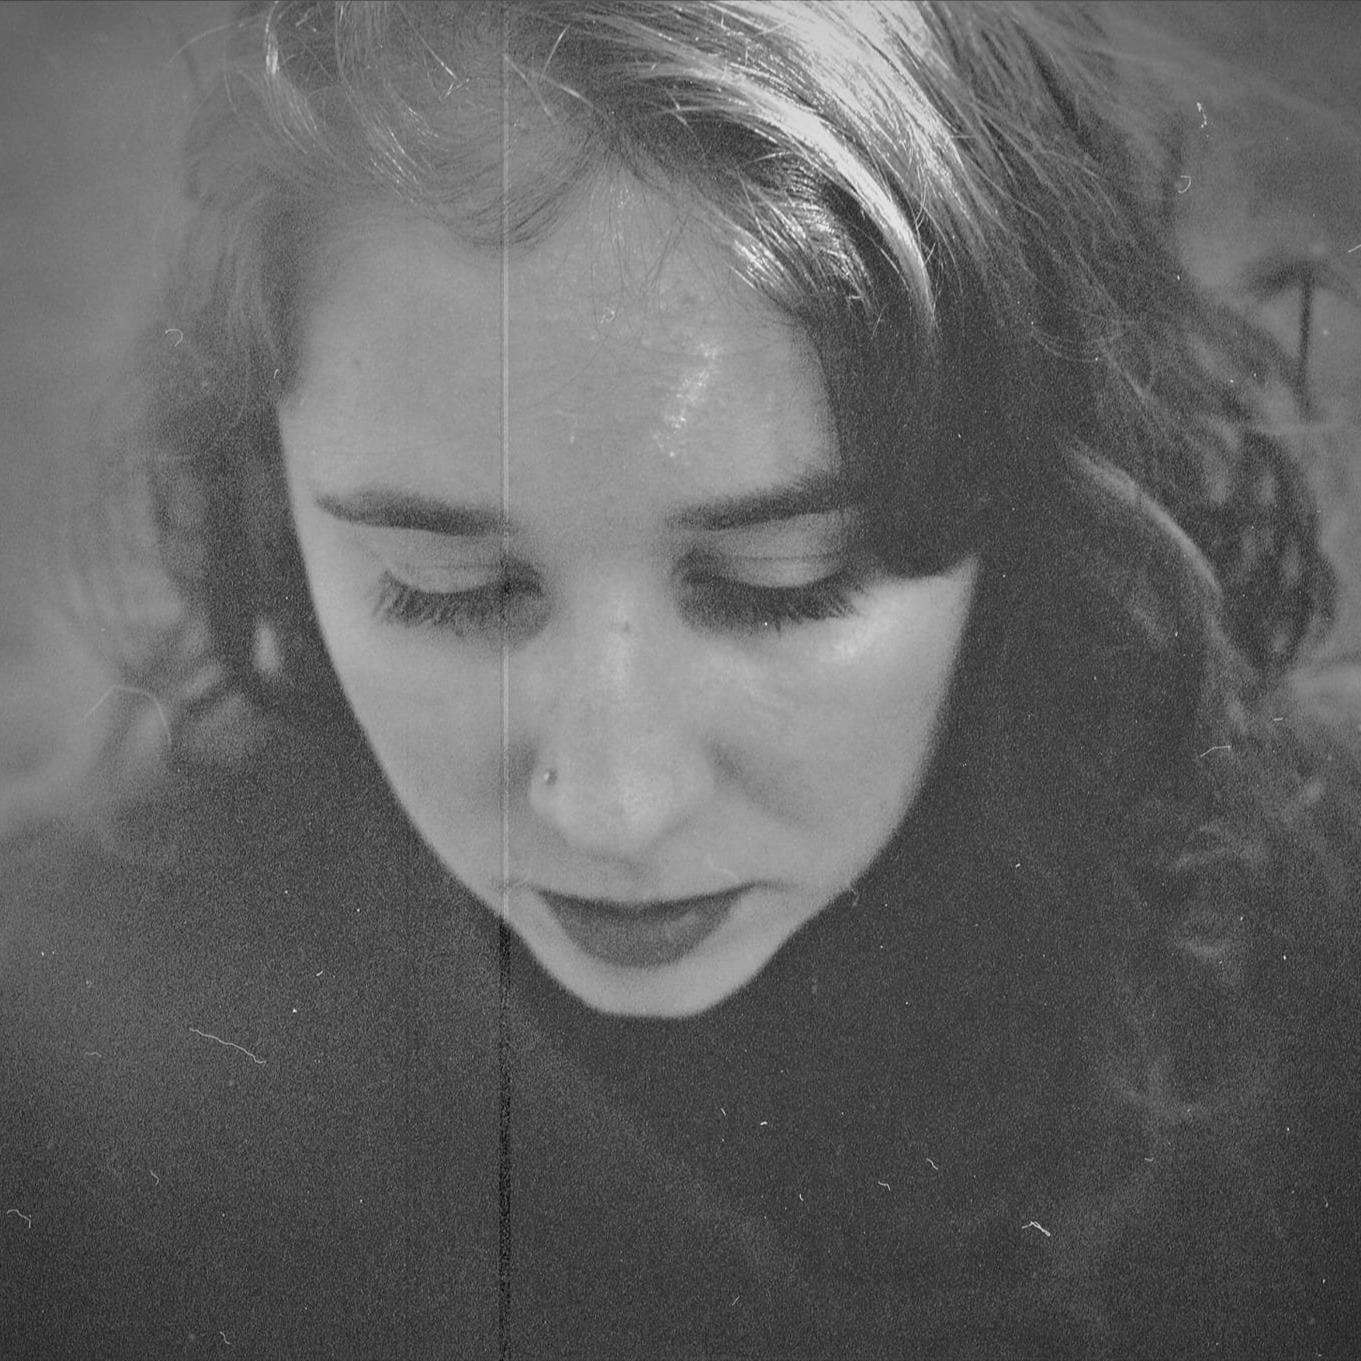 Géraldine Saucier (geraldine_saucier) Profile Image | Linktree